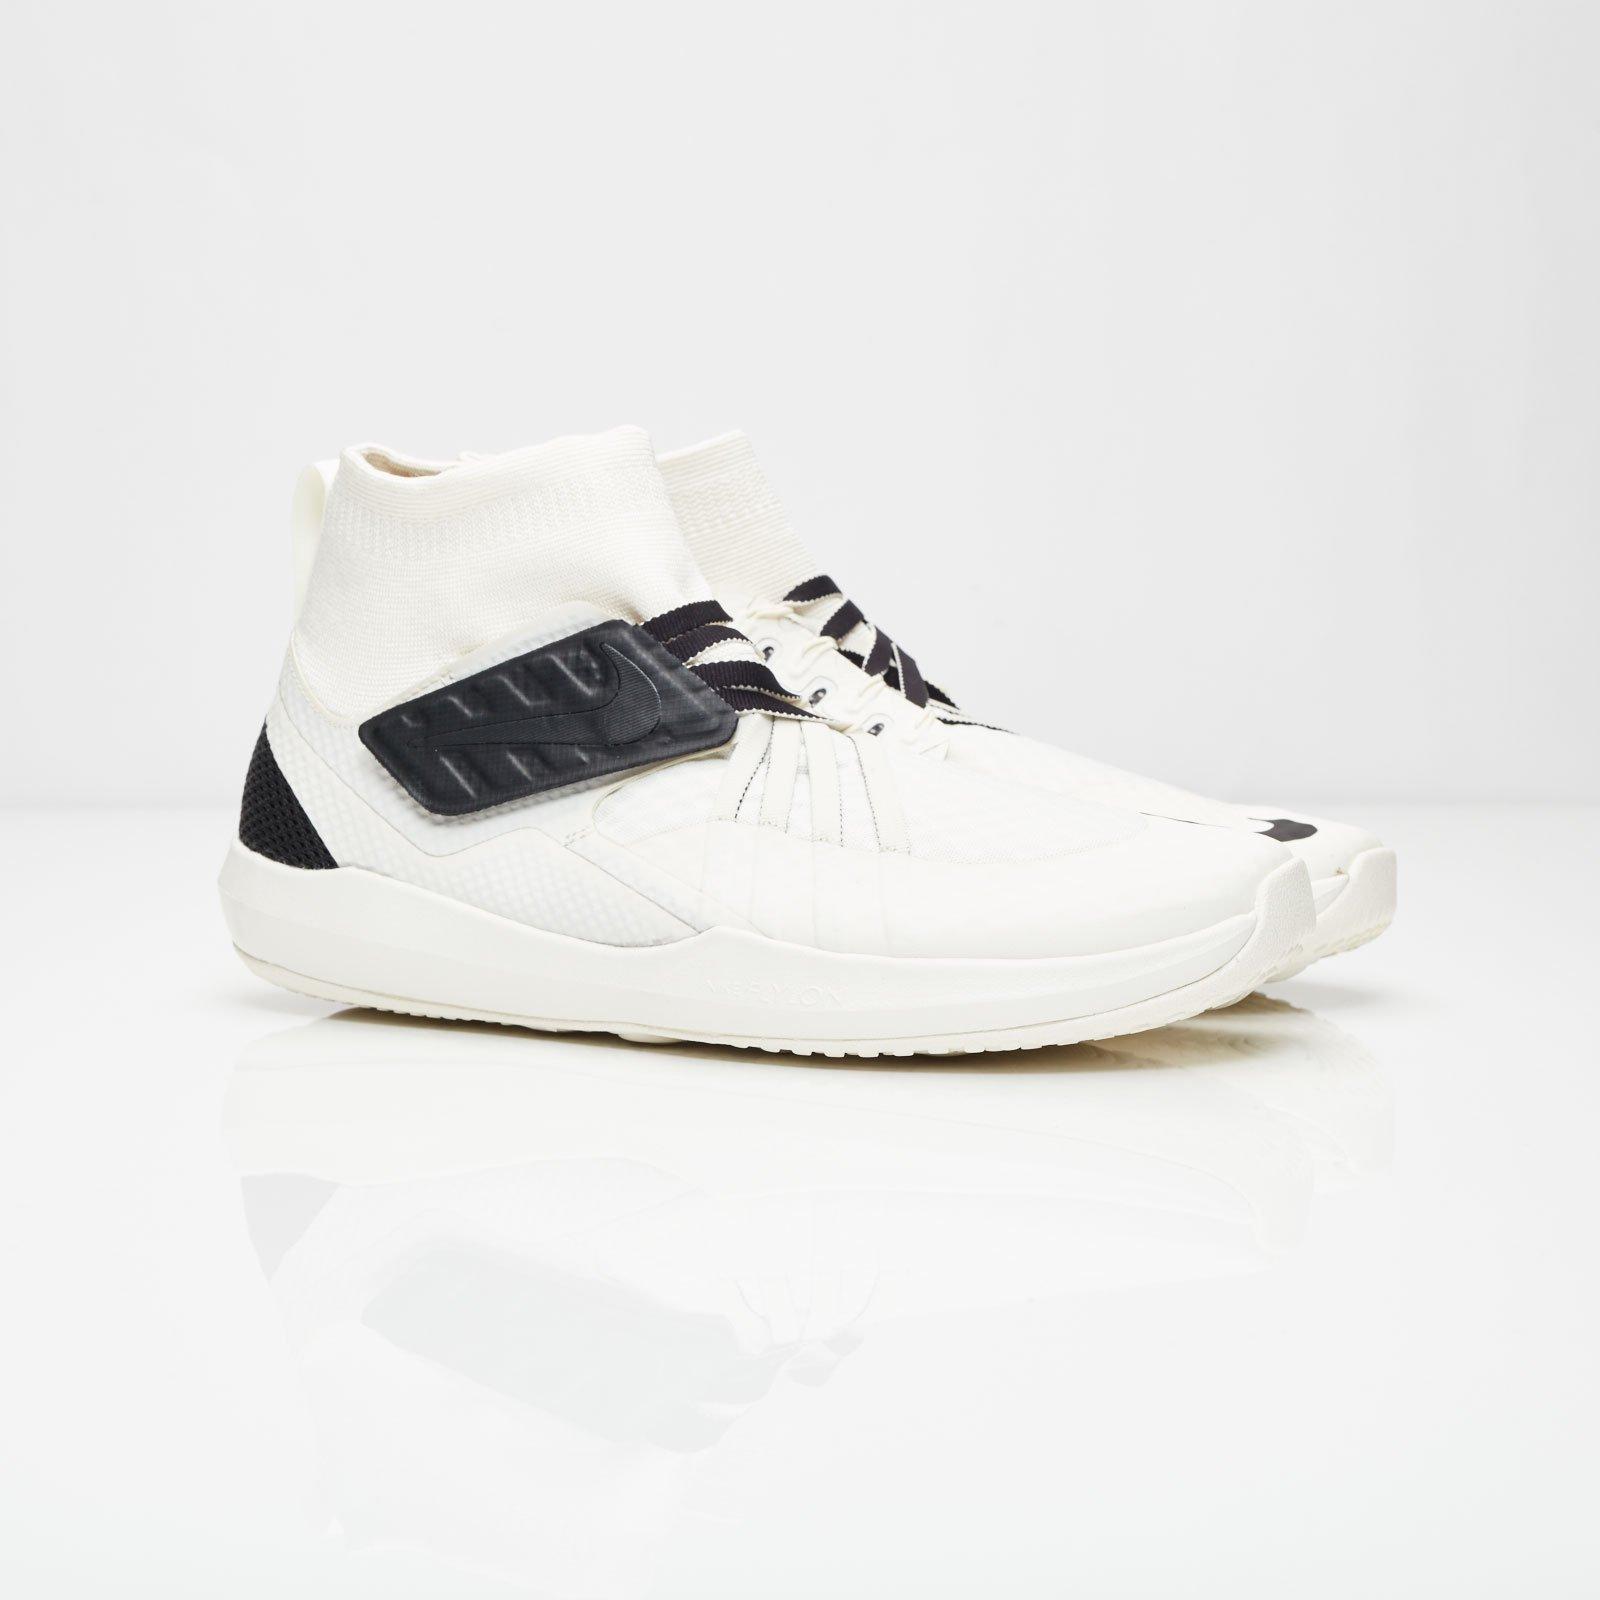 6bcb5dd88fbd Nike Flylon Train Dynamic Premium QS - 882105-100 - Sneakersnstuff ...